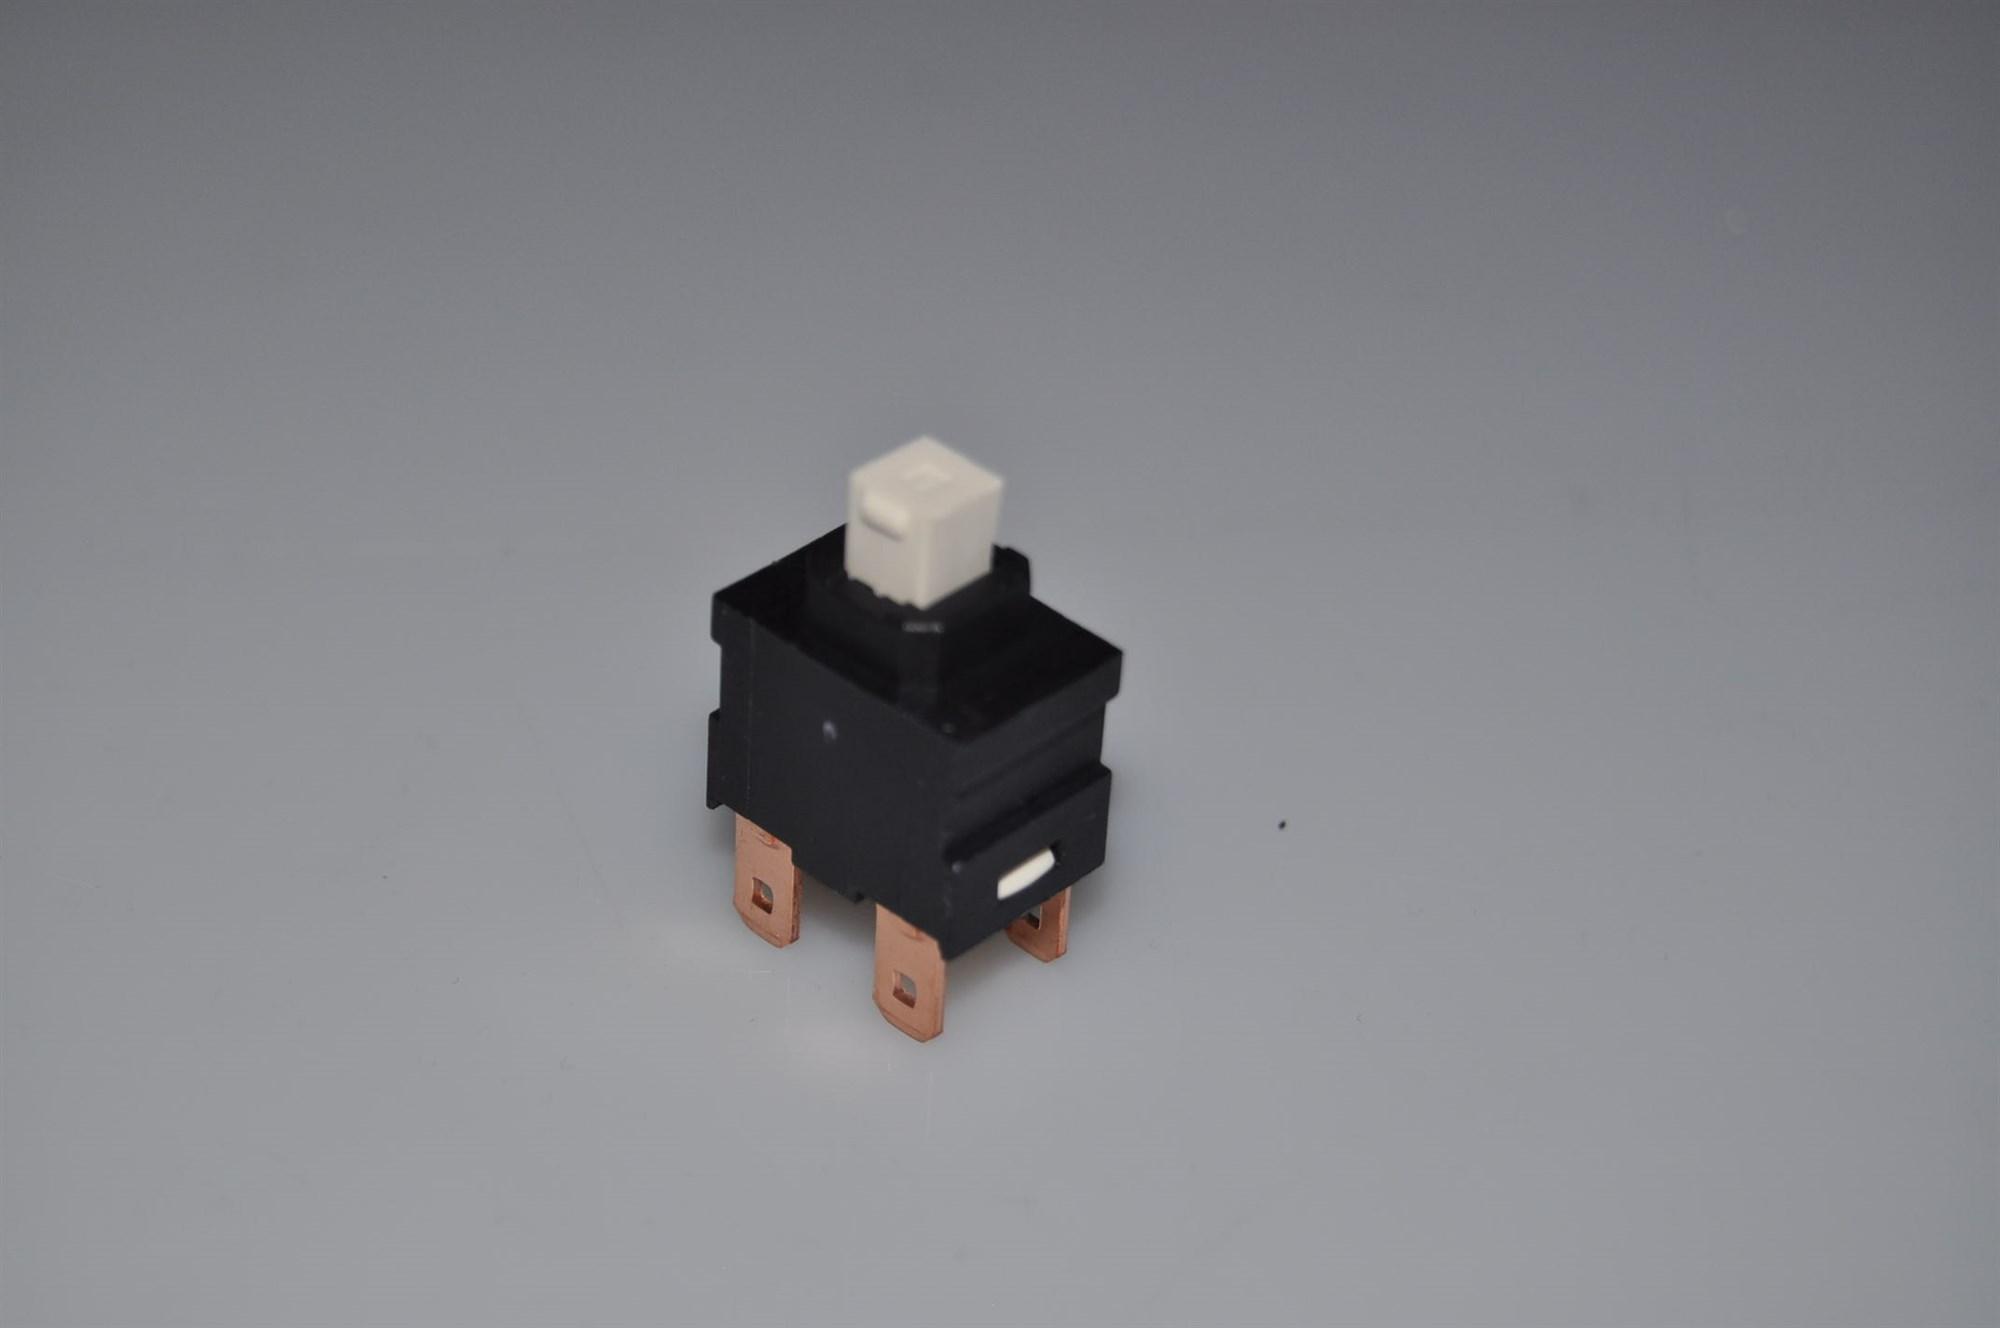 schalter nilfisk staubsauger an aus. Black Bedroom Furniture Sets. Home Design Ideas